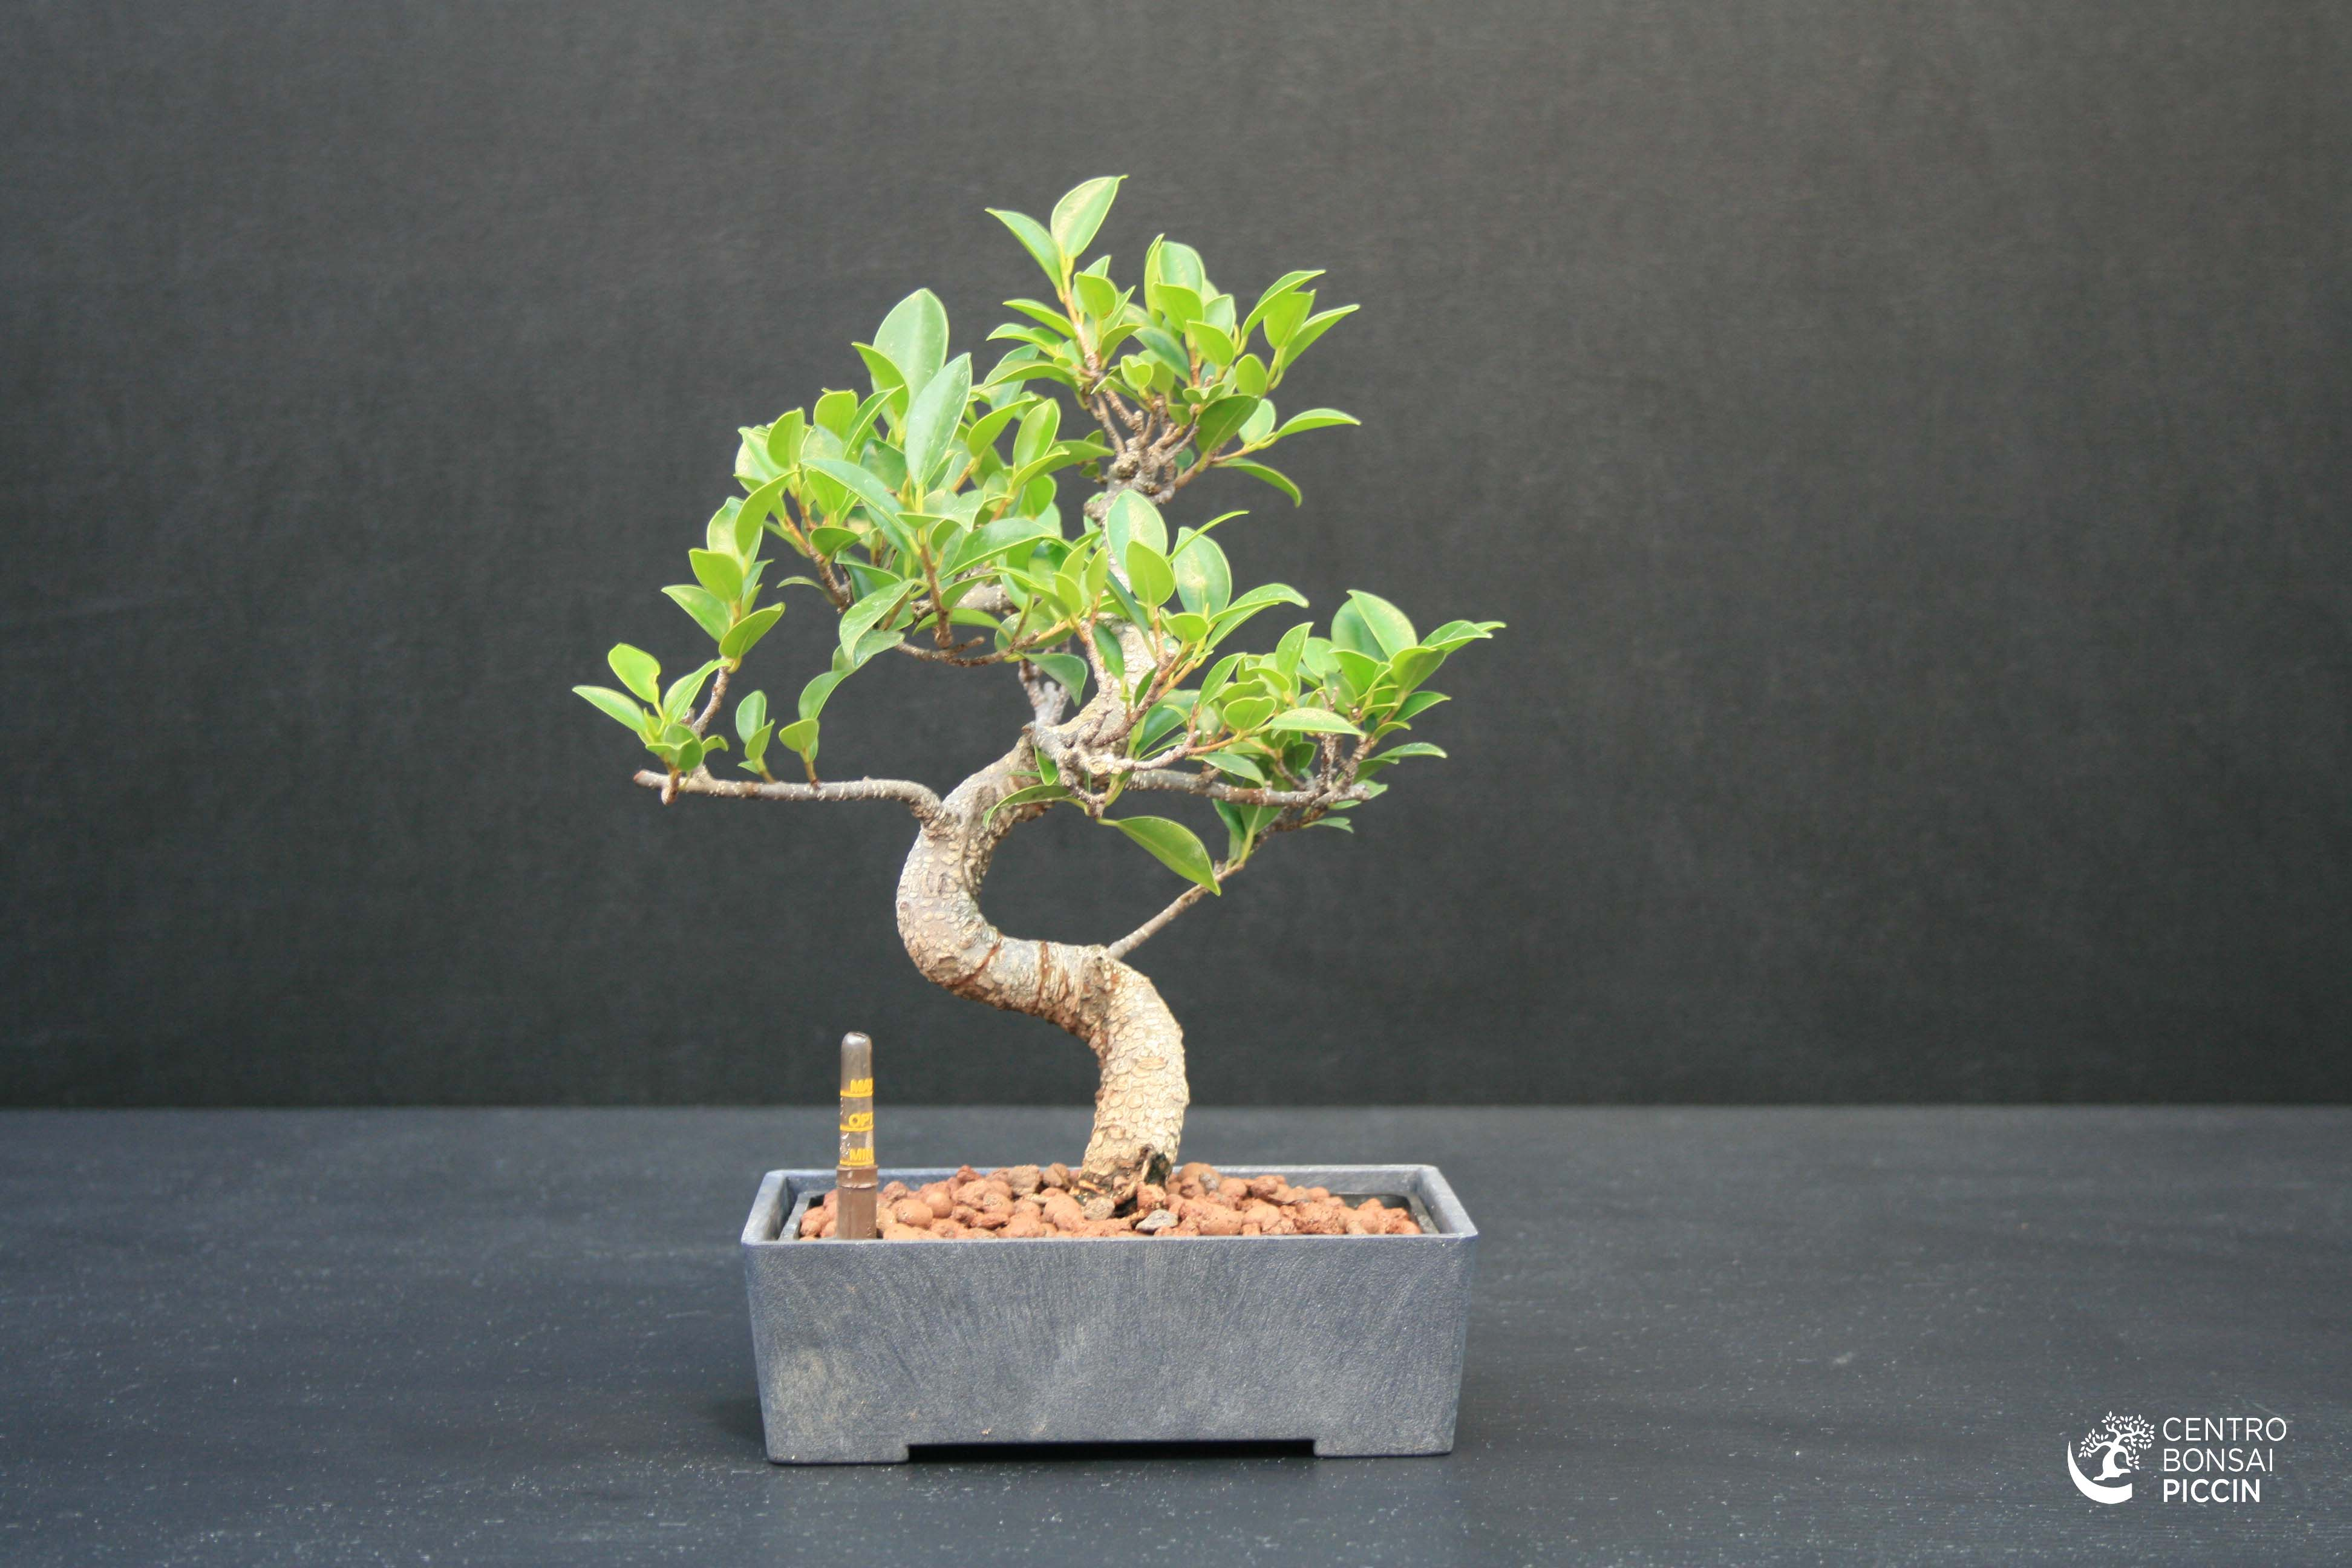 Bonsai ficus prezzi e cura bonsai ficus bonsaipiccin for Bonsai prezzi